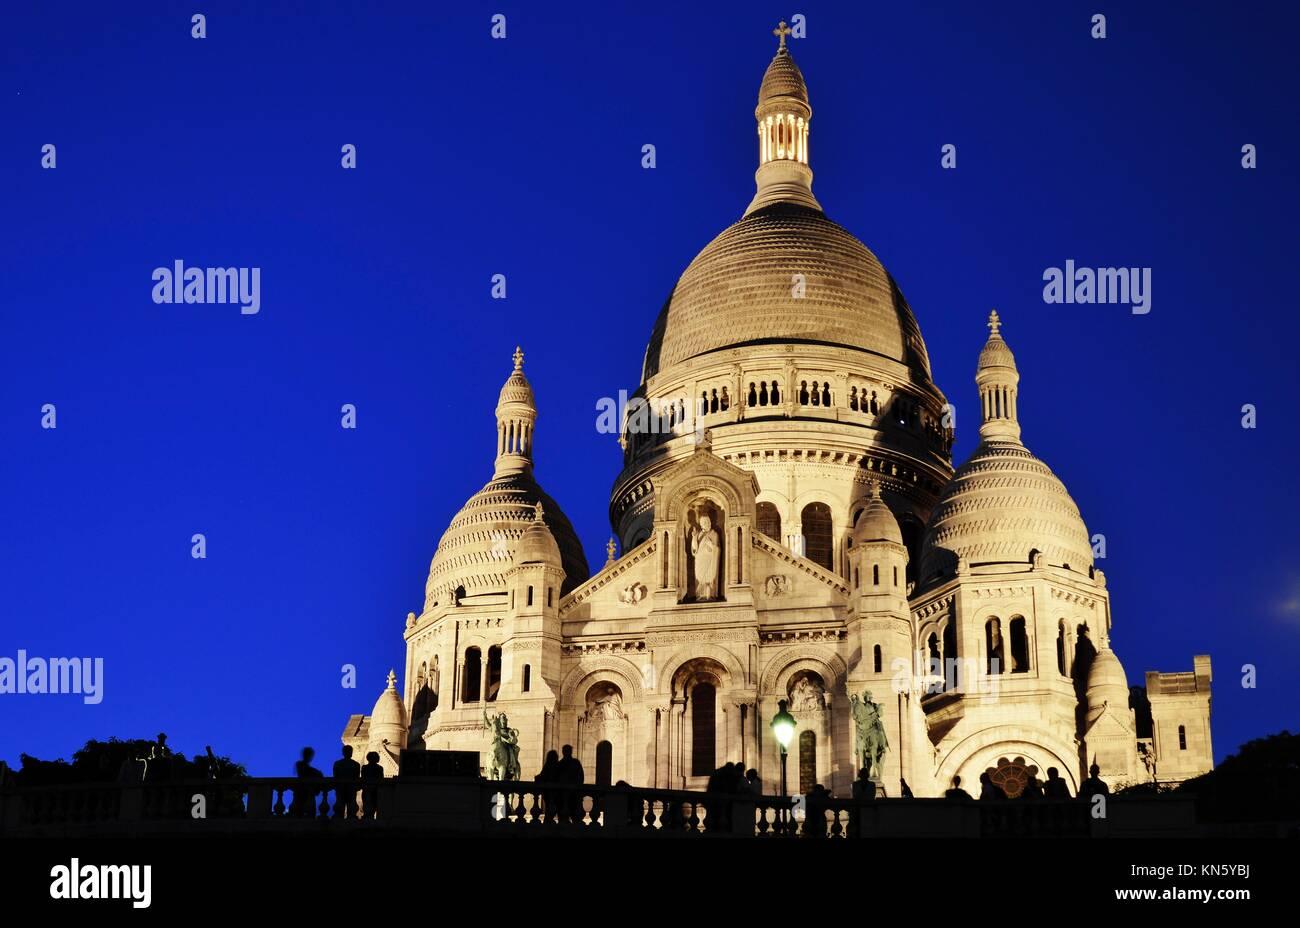 Basilica Sacre Coeur (Sacred Heart of Jesus) on Montmartre in Paris, France. - Stock Image